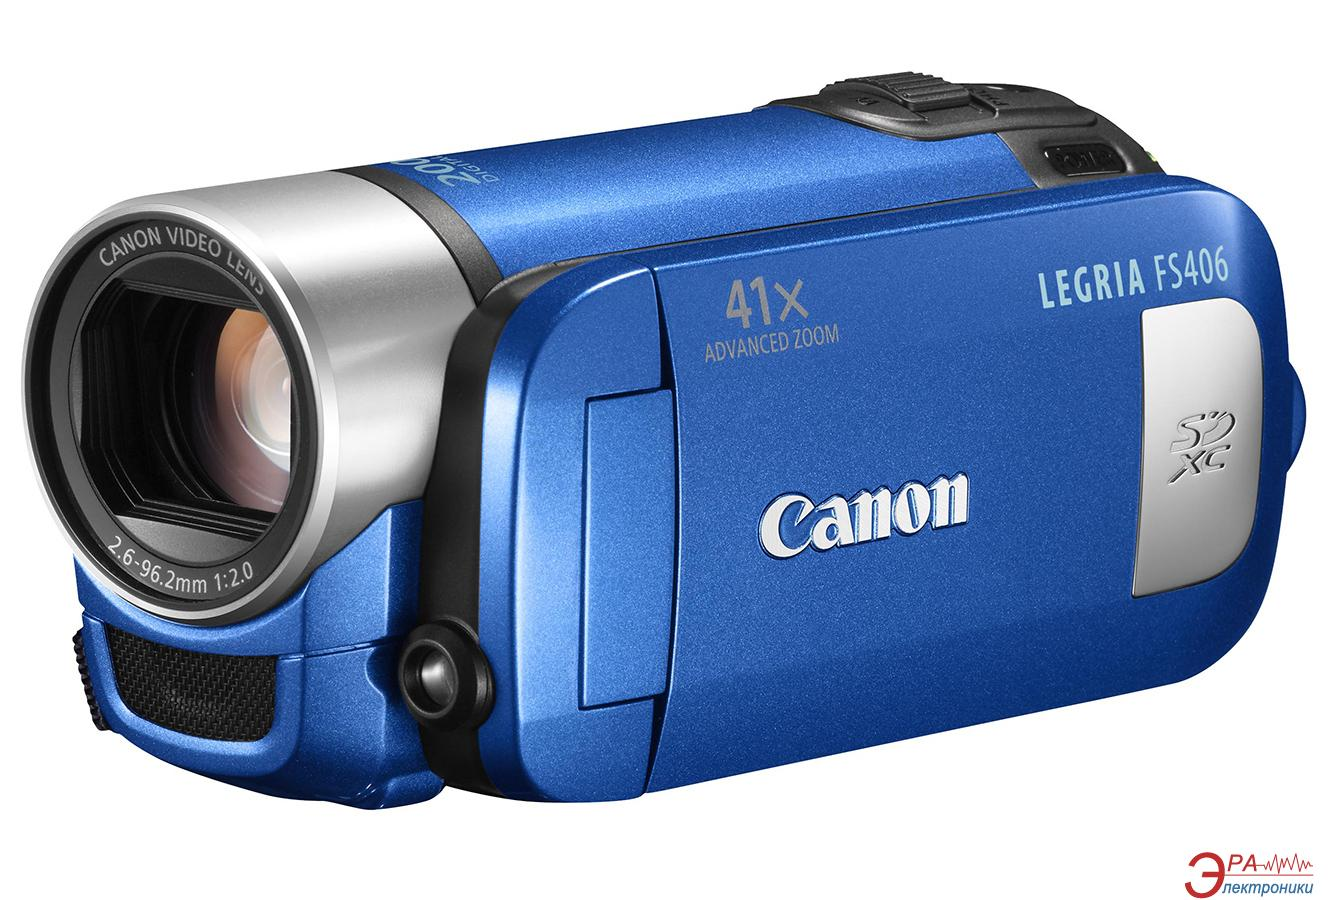 Цифровая видеокамера Canon Legria FS406 Blue (5026B037)